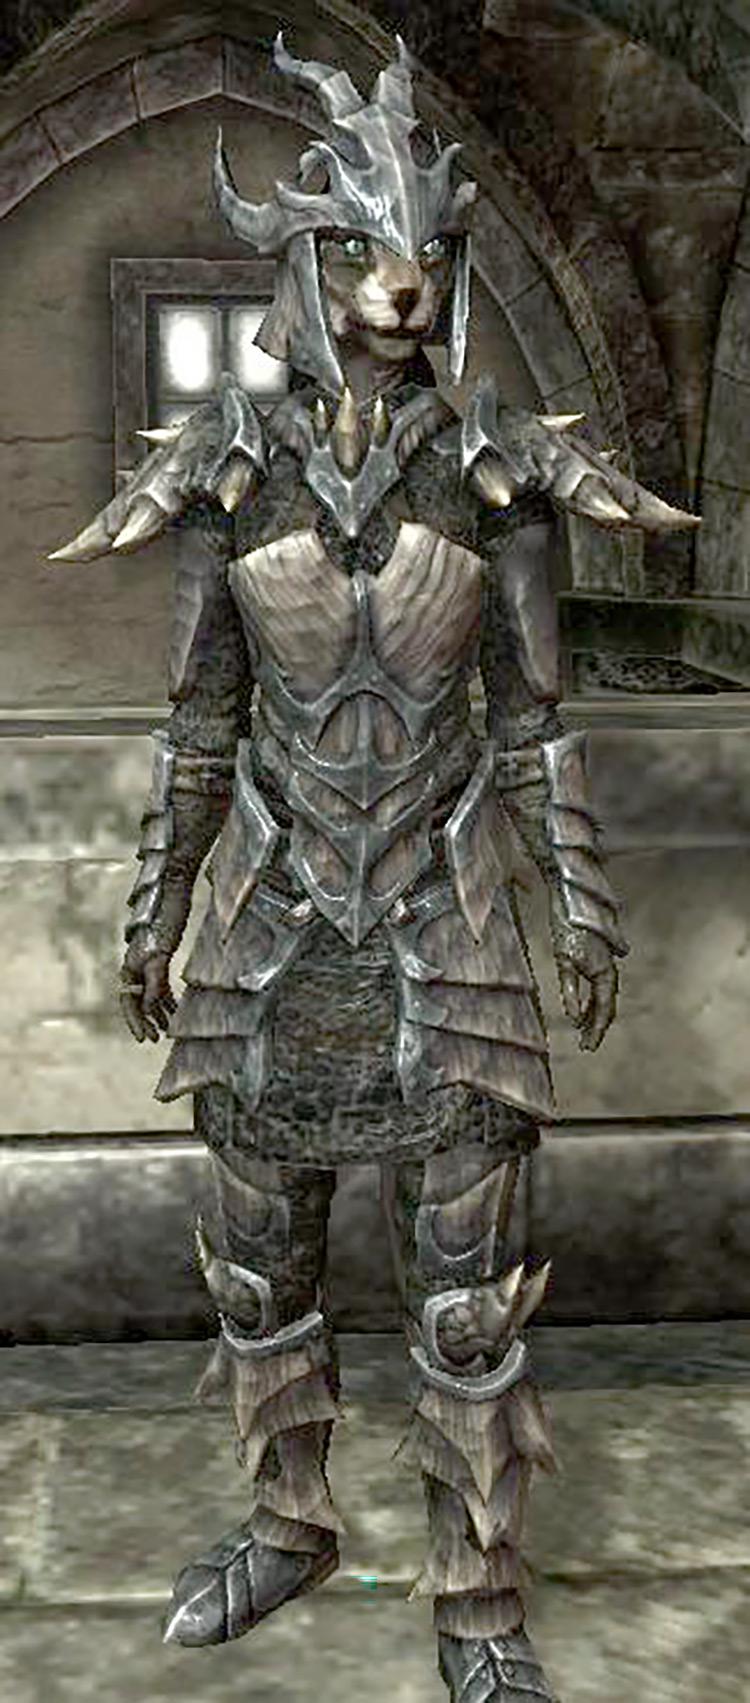 Dragonscale Armor Set in Skyrim